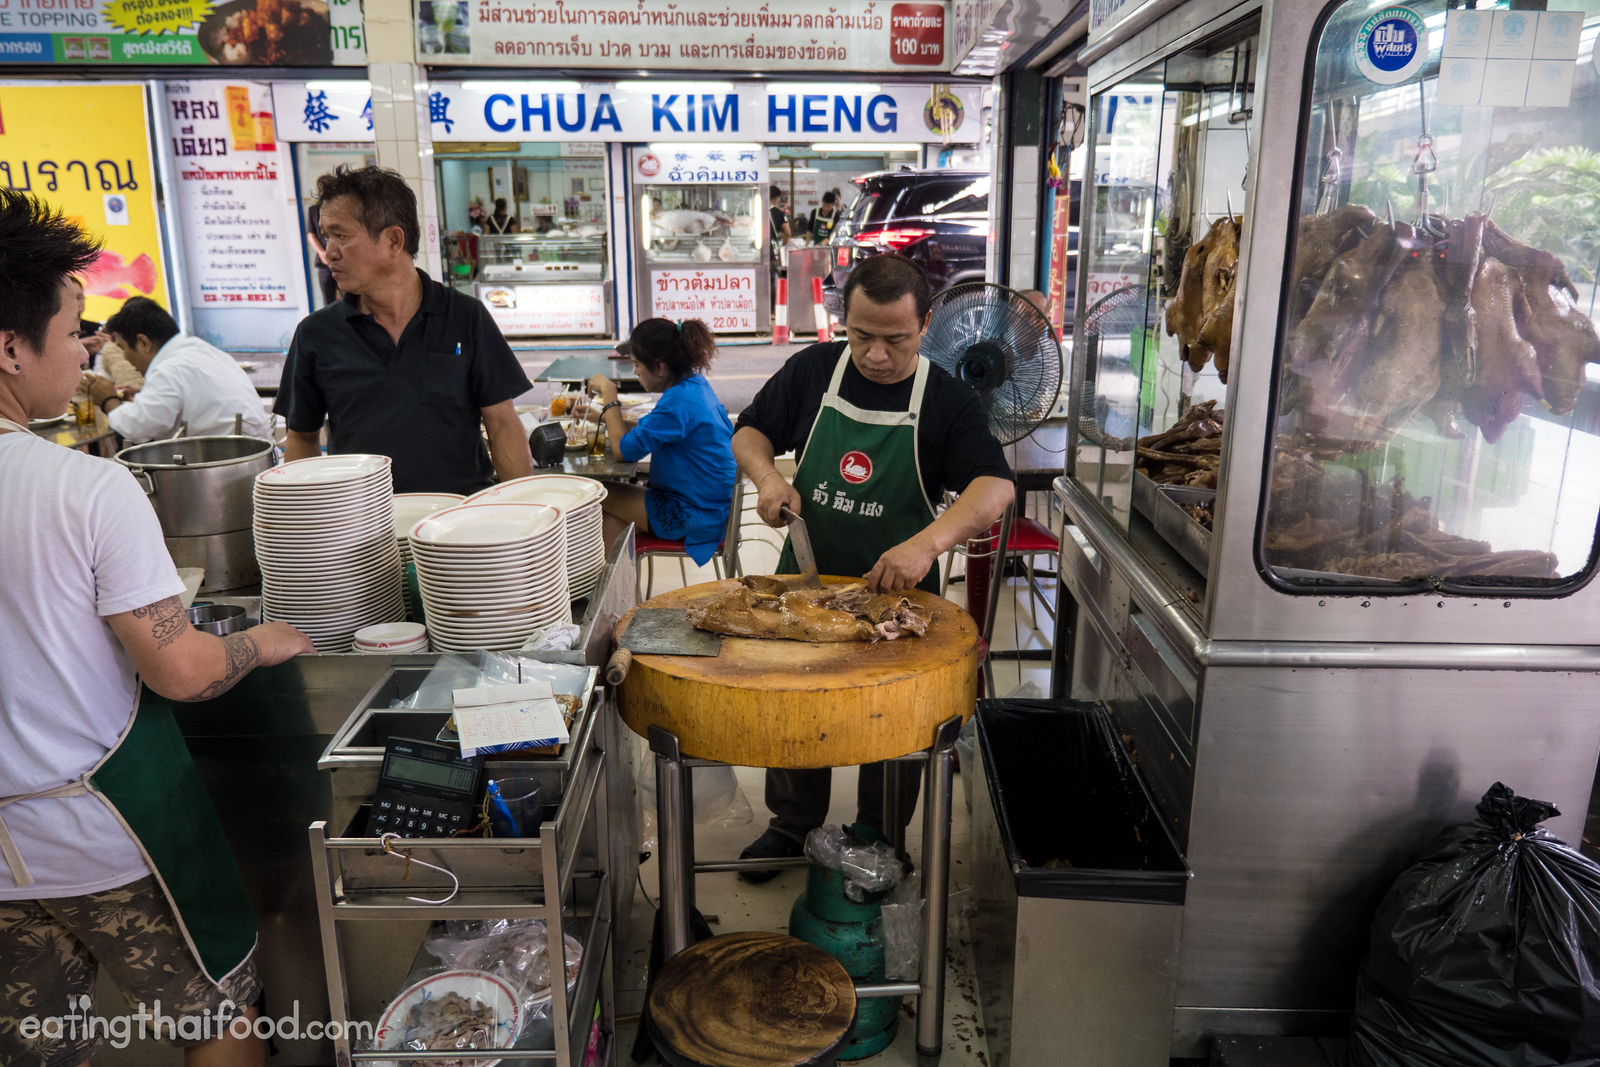 Legendary braised goose at Chua Kim Heng (ร้านฉั่วคิมเฮง)